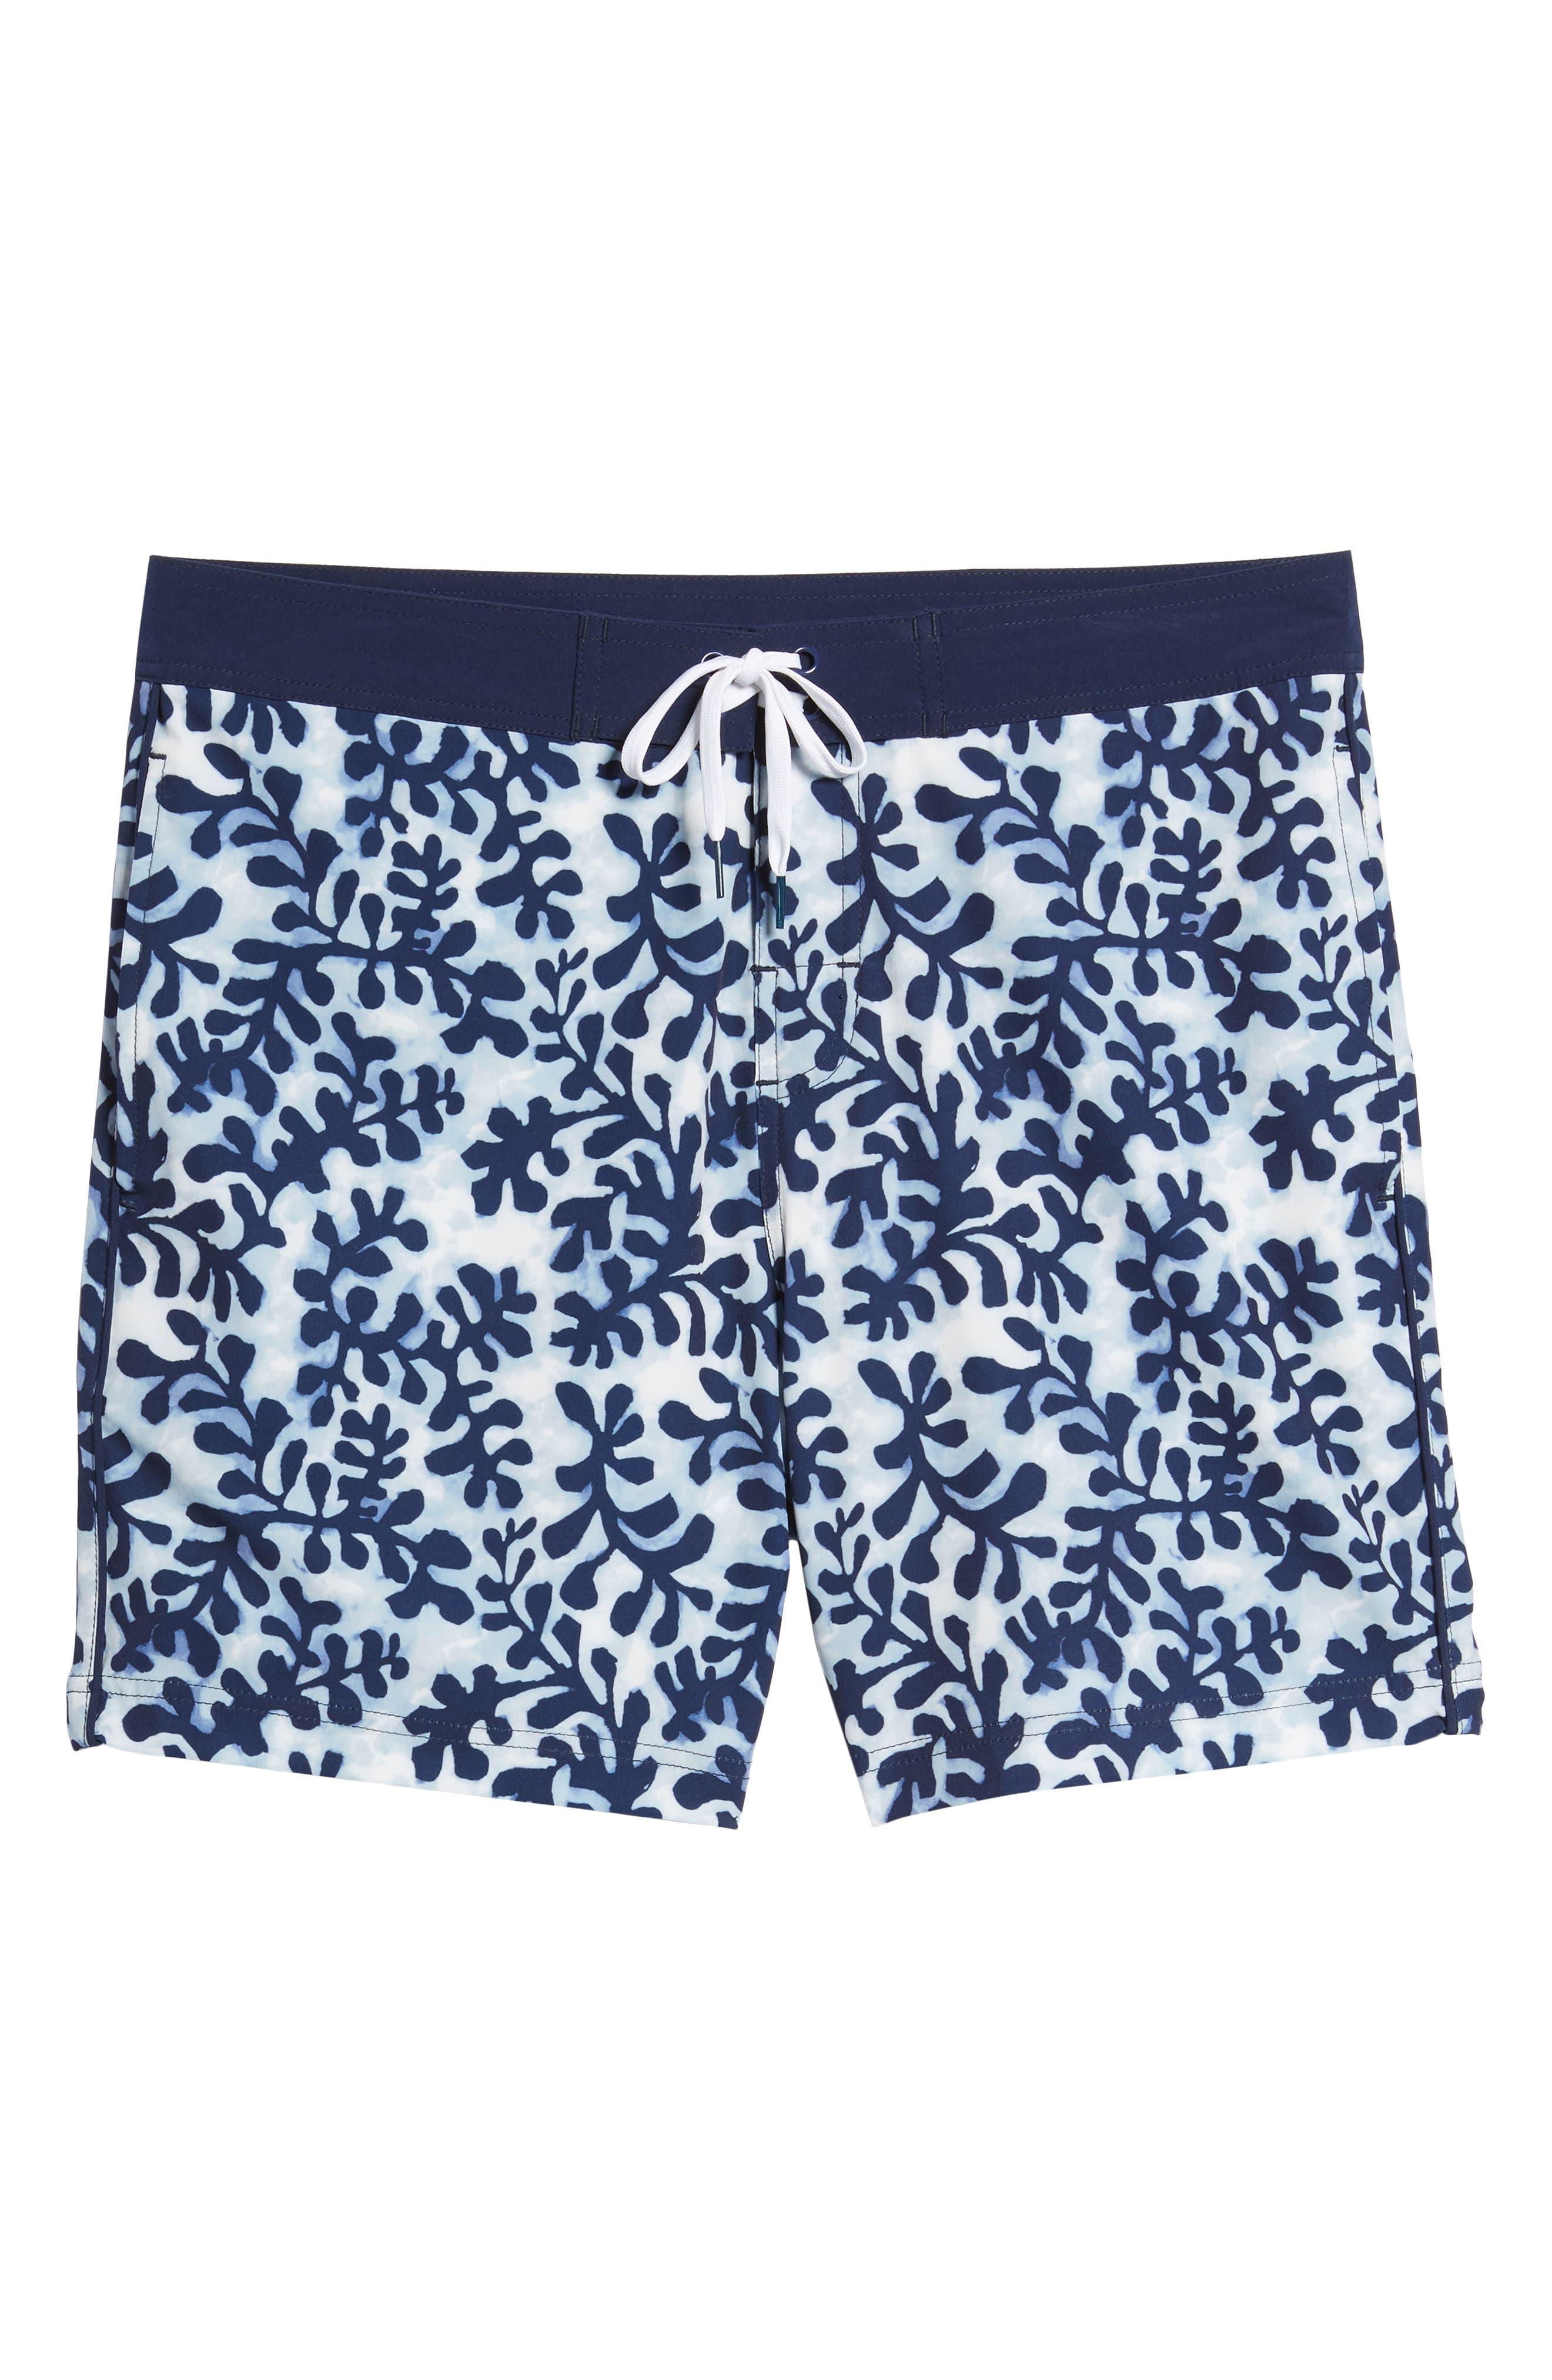 Seaweed Board Shorts,                             Alternate thumbnail 6, color,                             463